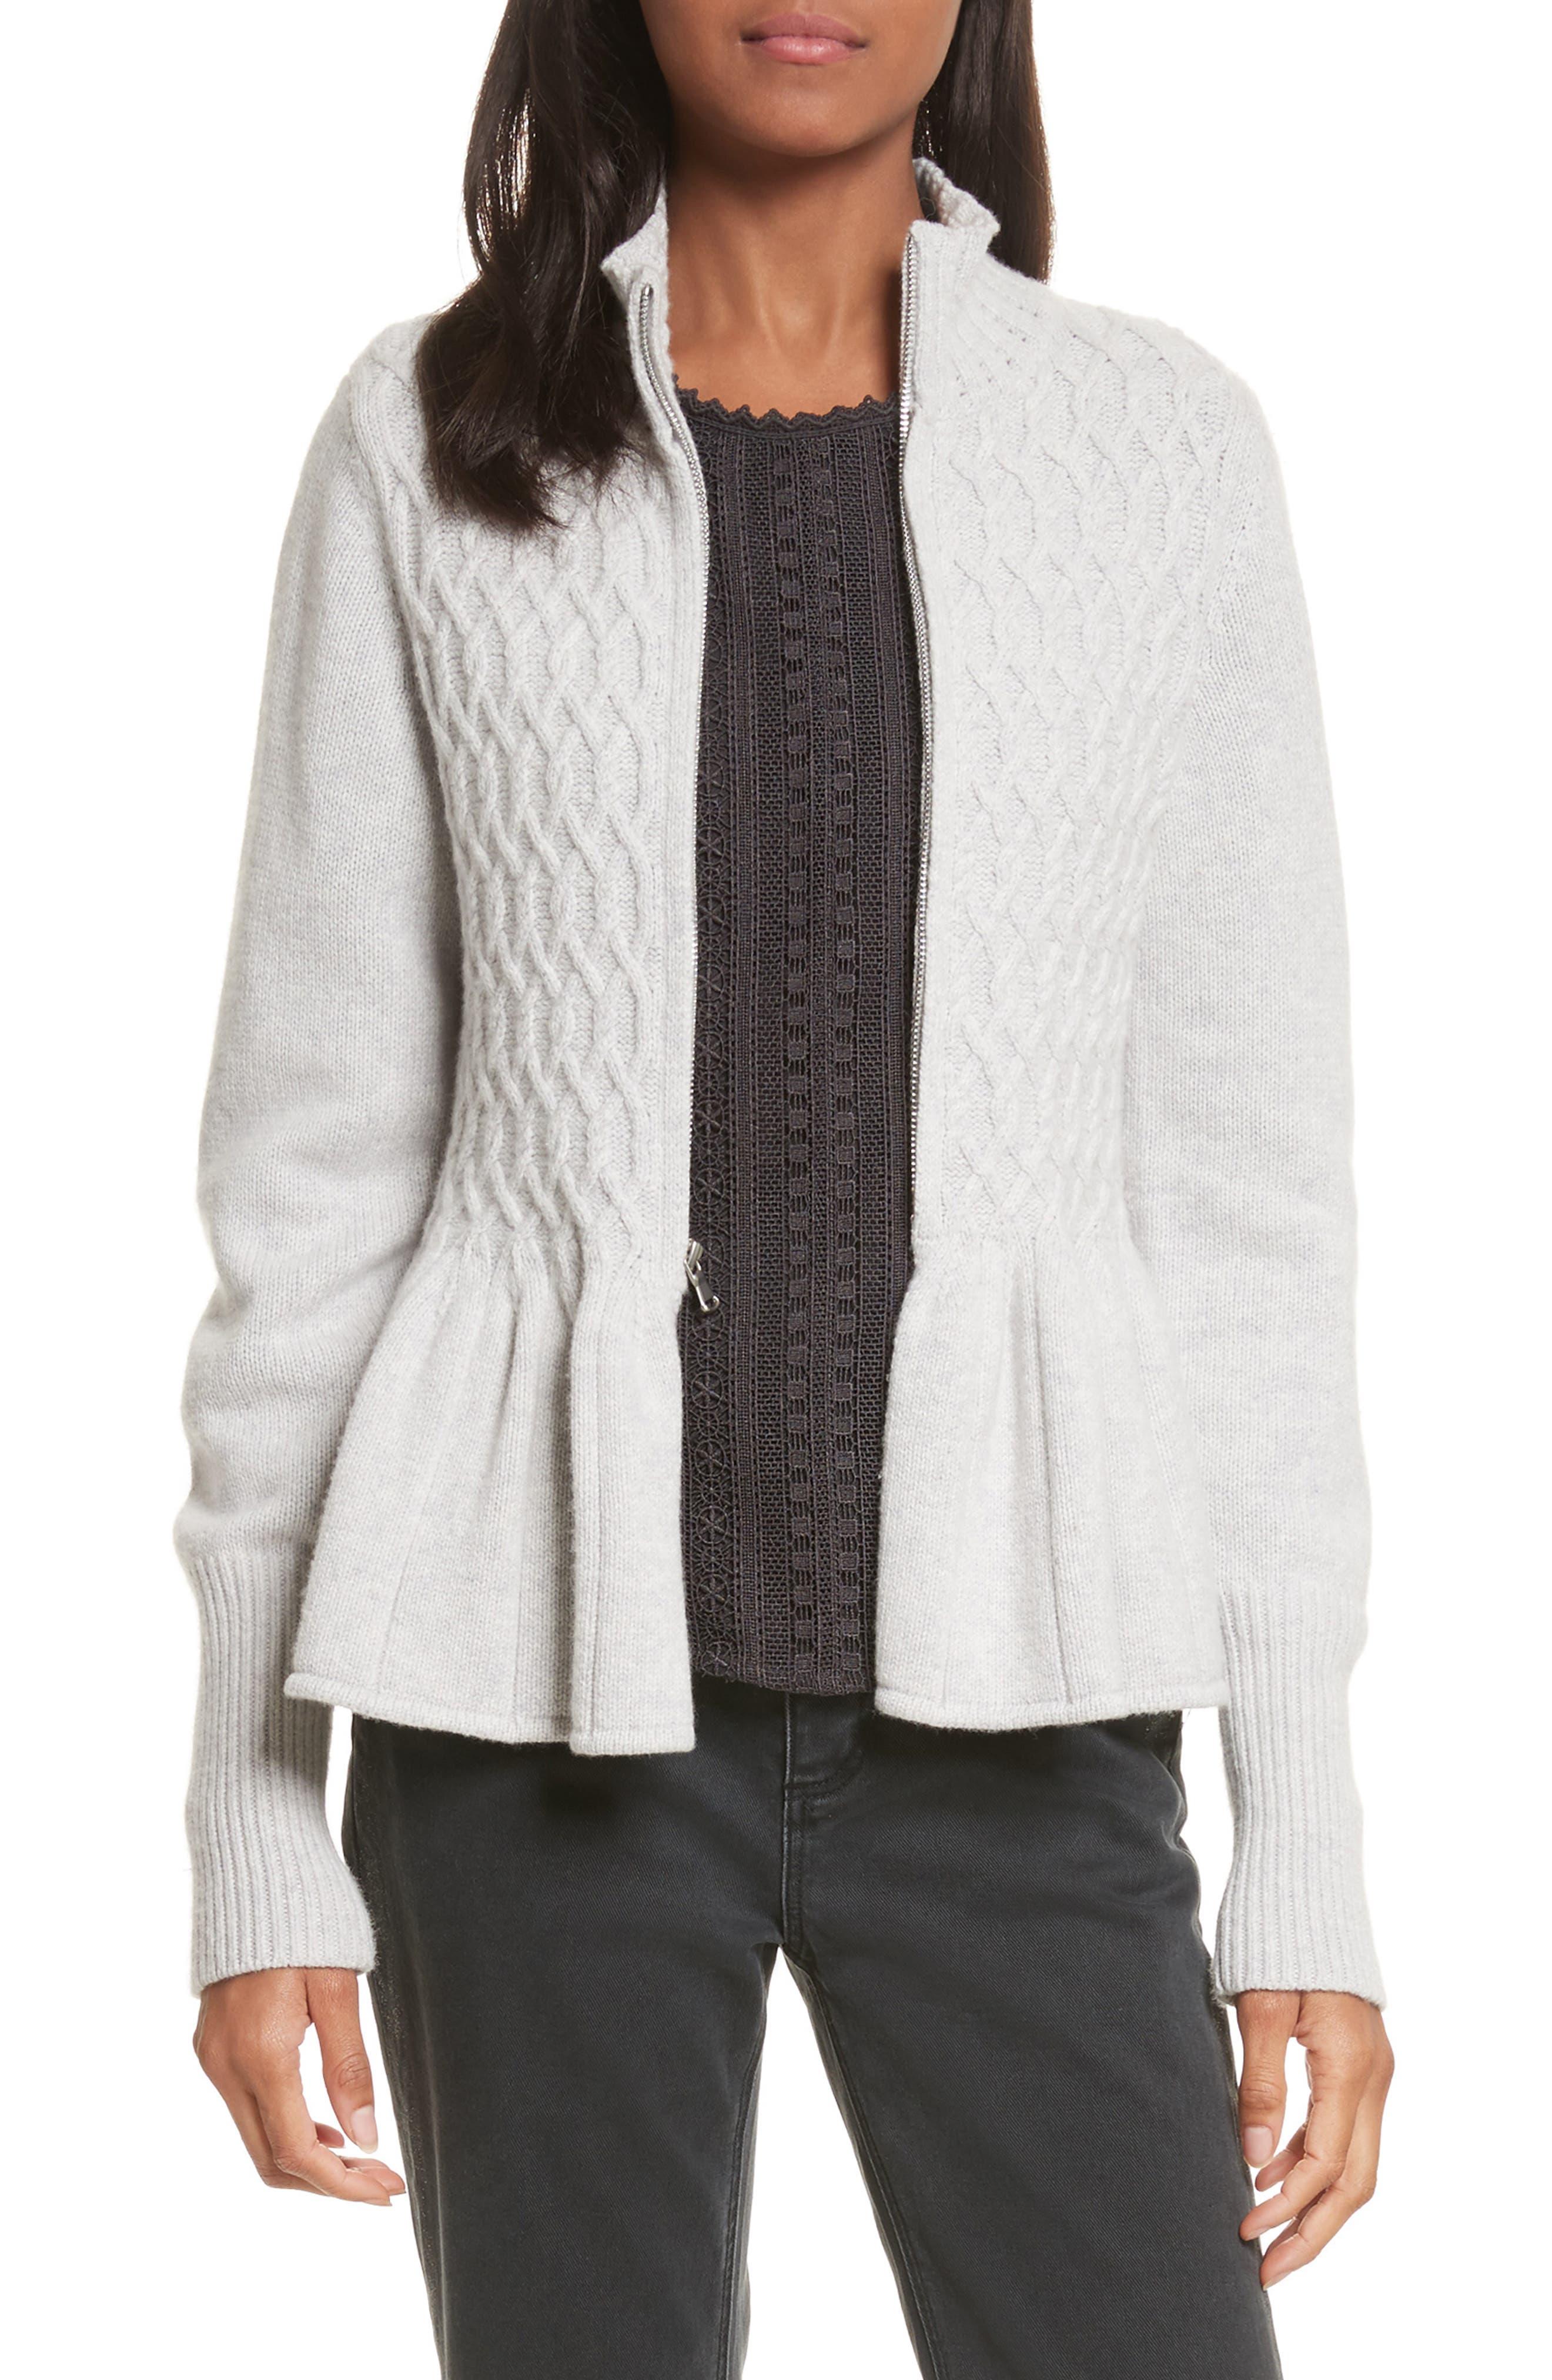 La Vie Rebecca Taylor Cable Knit Front Zip Cardigan